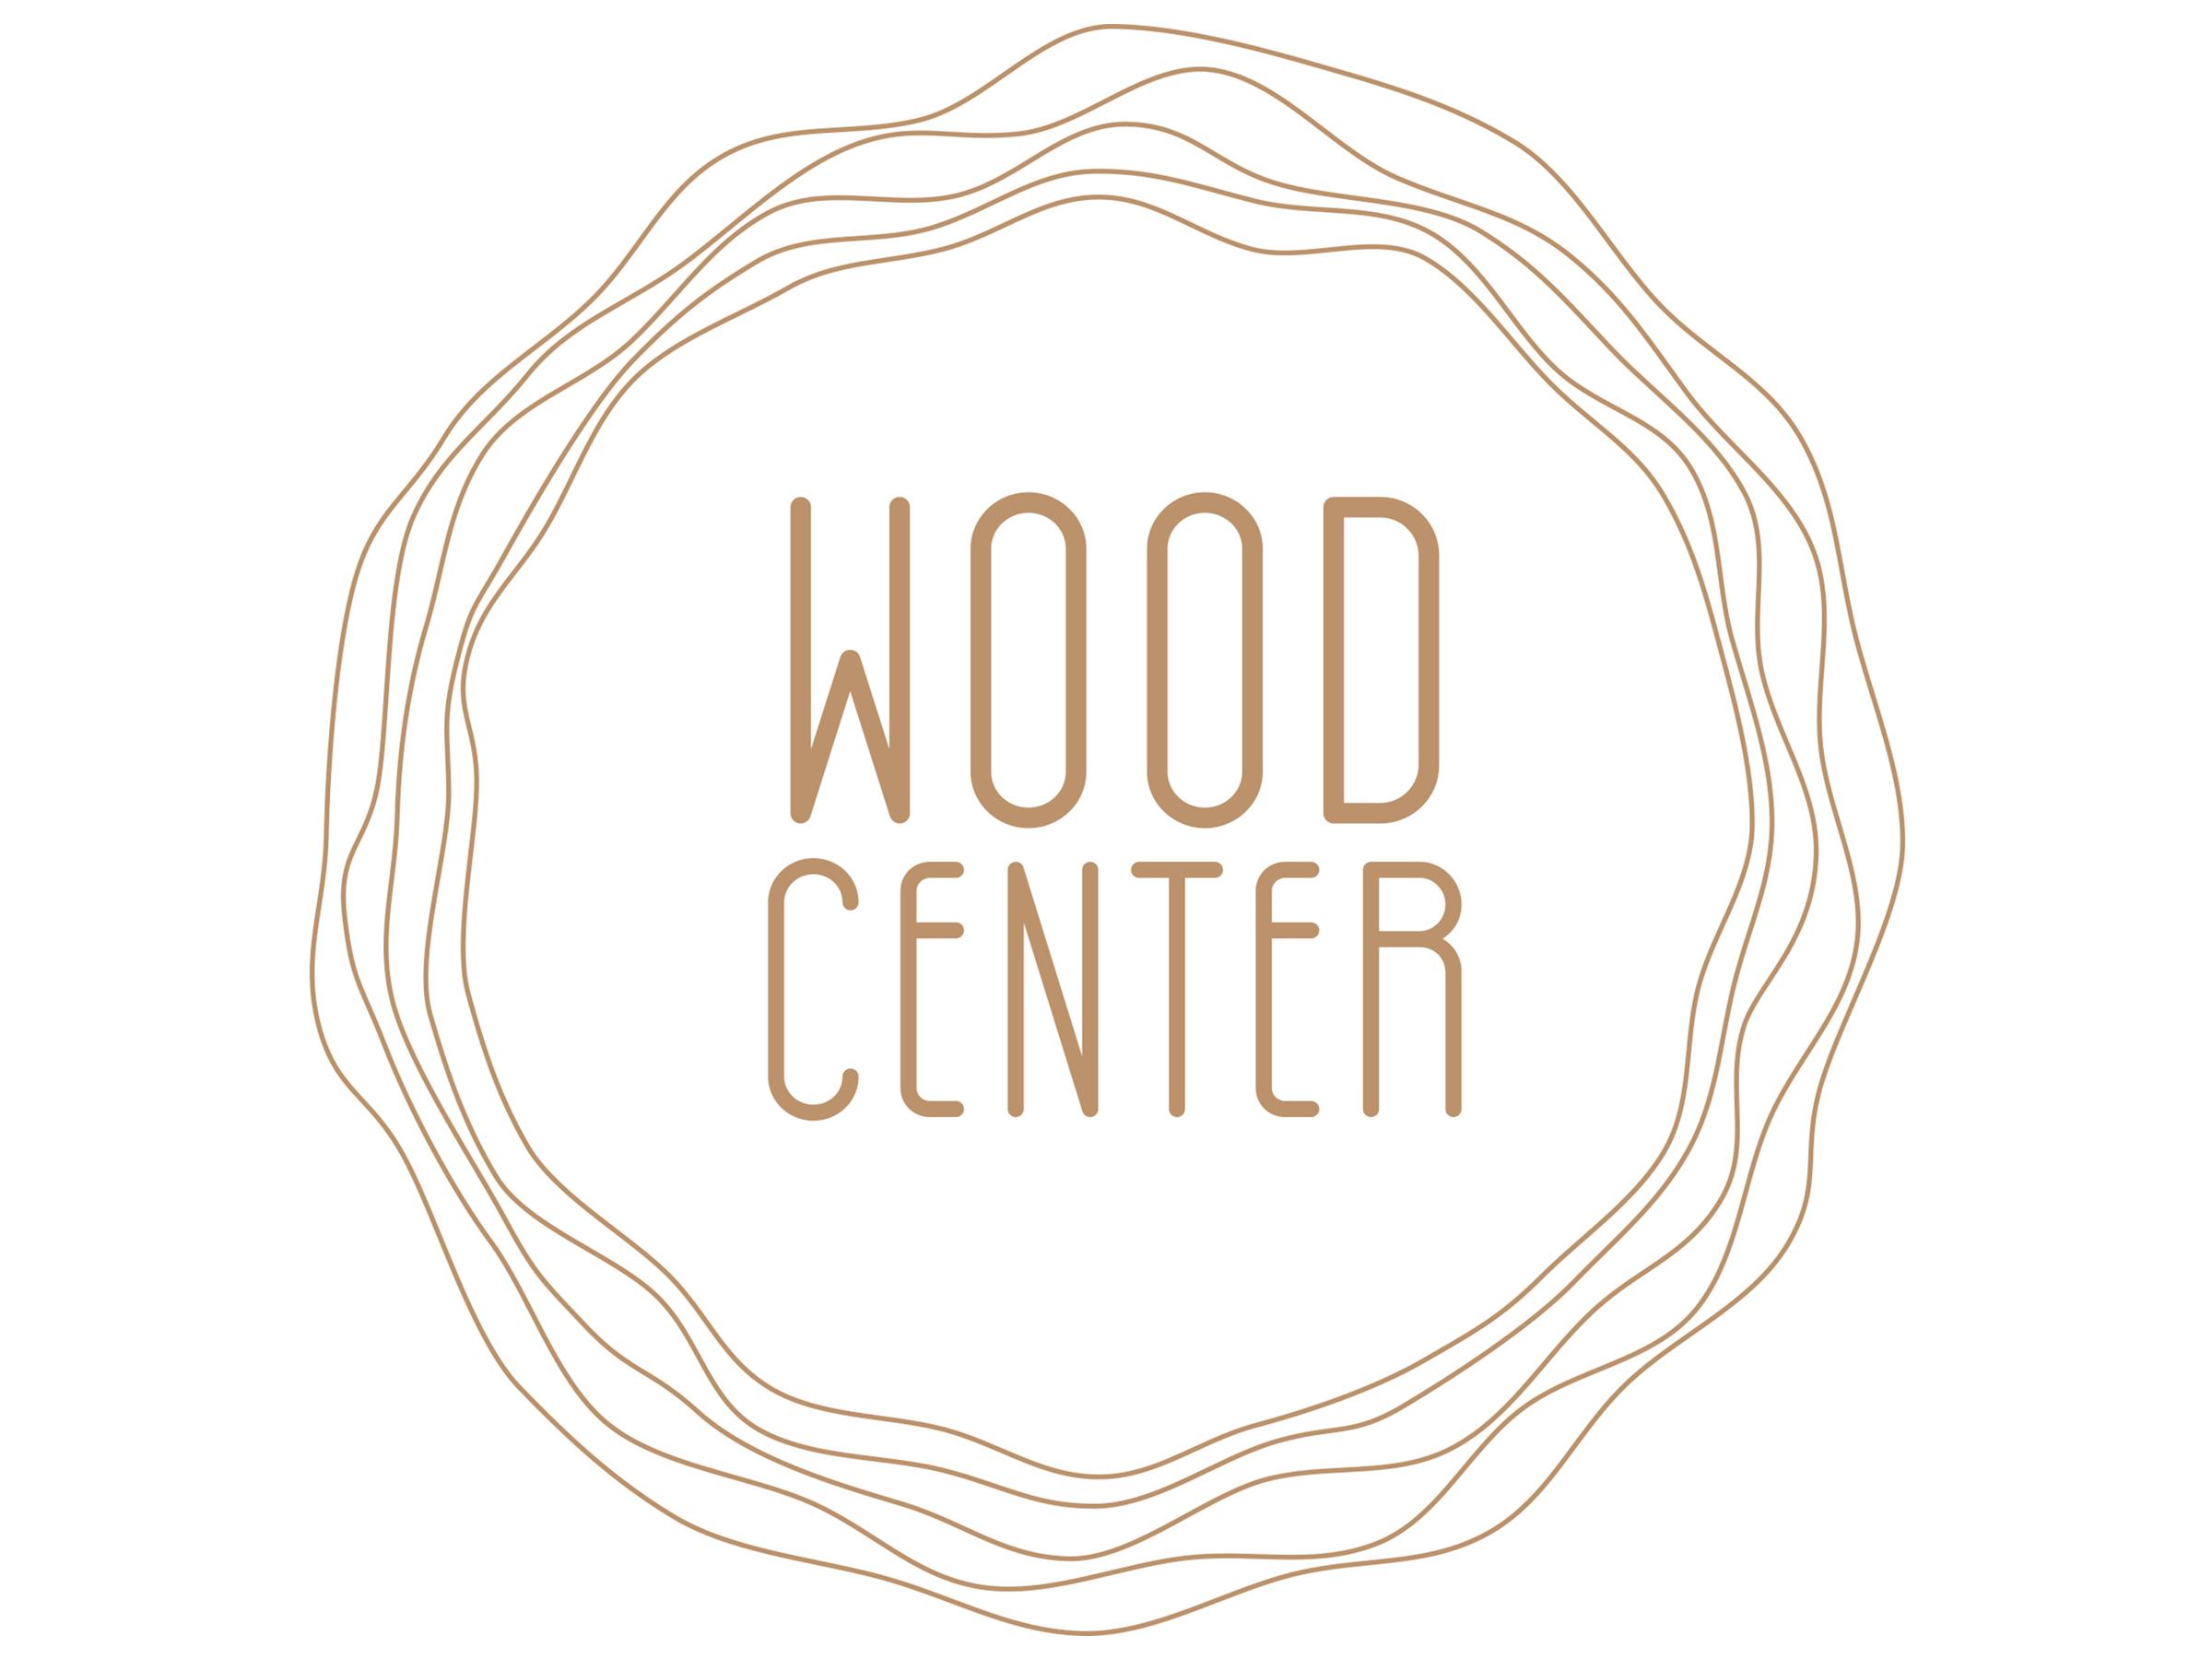 Inteligencia Marketing - WOOD CENTER – NOVA IDENTIDADE - Untitled-1